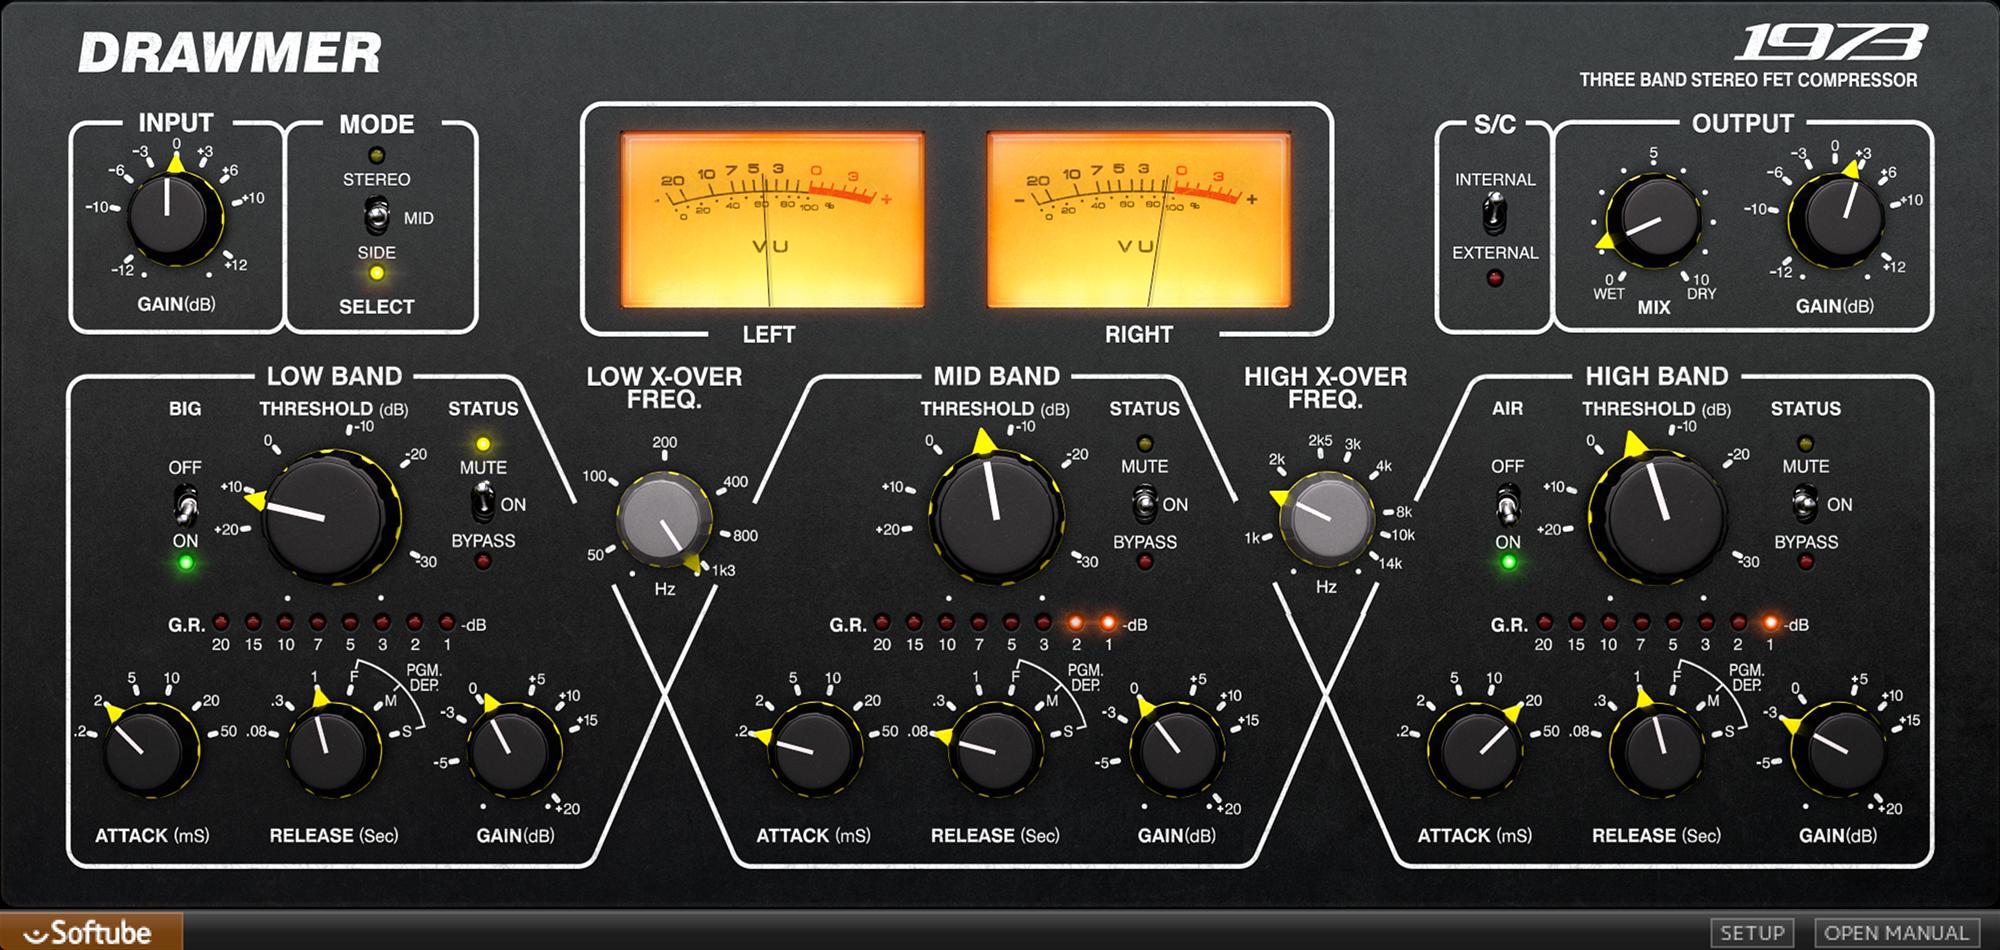 Drawmer 1973 Multi Band Compressor Music Mixing Music Software Music